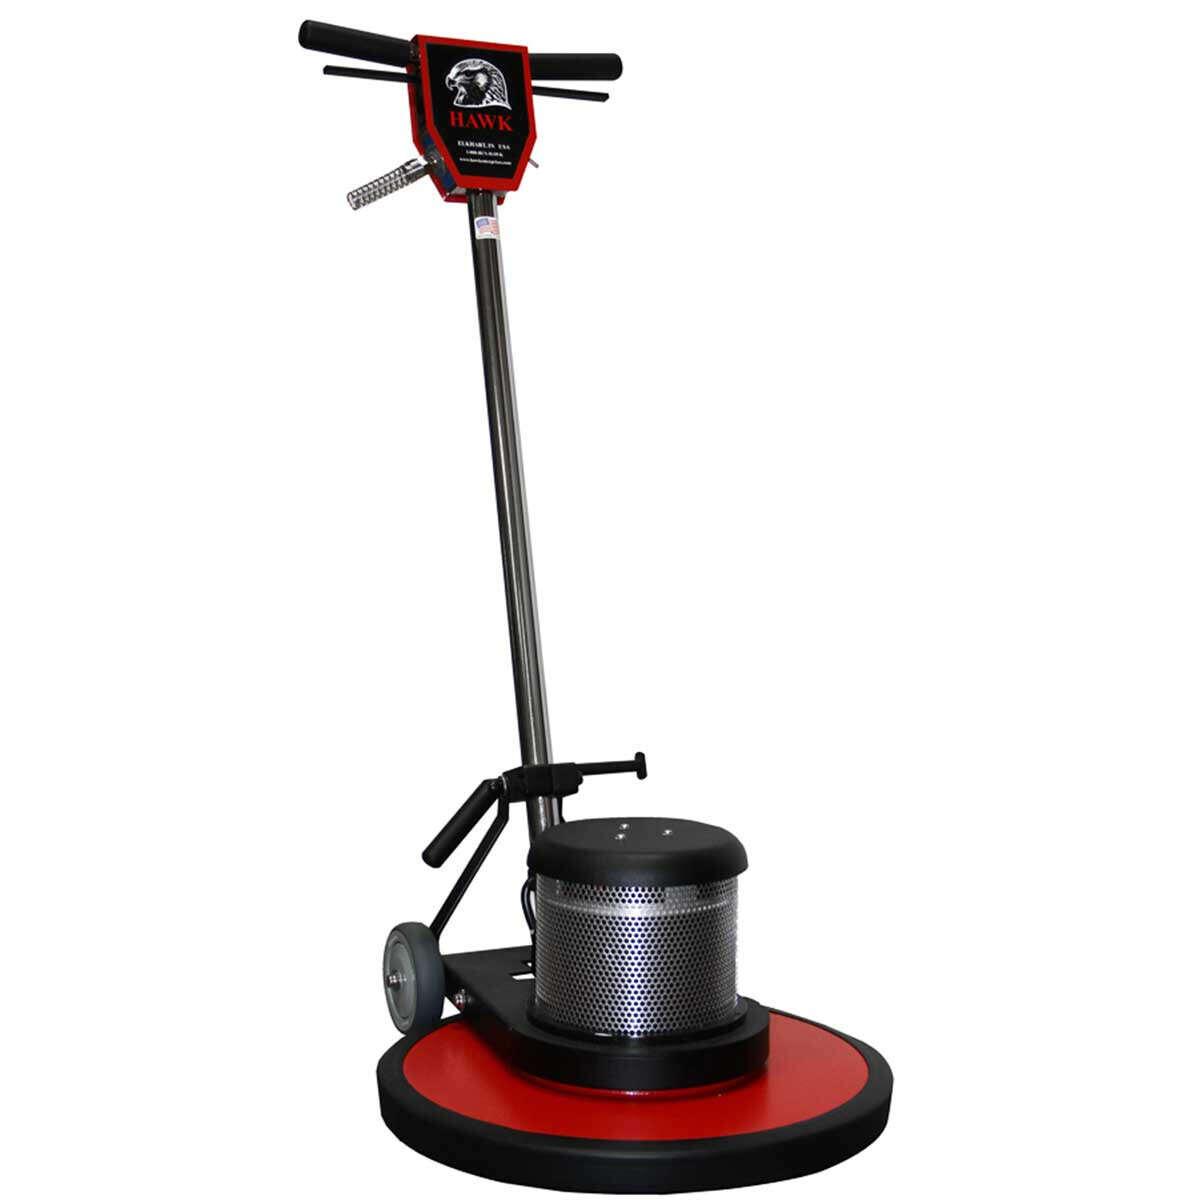 20 inch Hawk 1-1/2 Hp Two Speed Standard Floor Machine F03-20-01